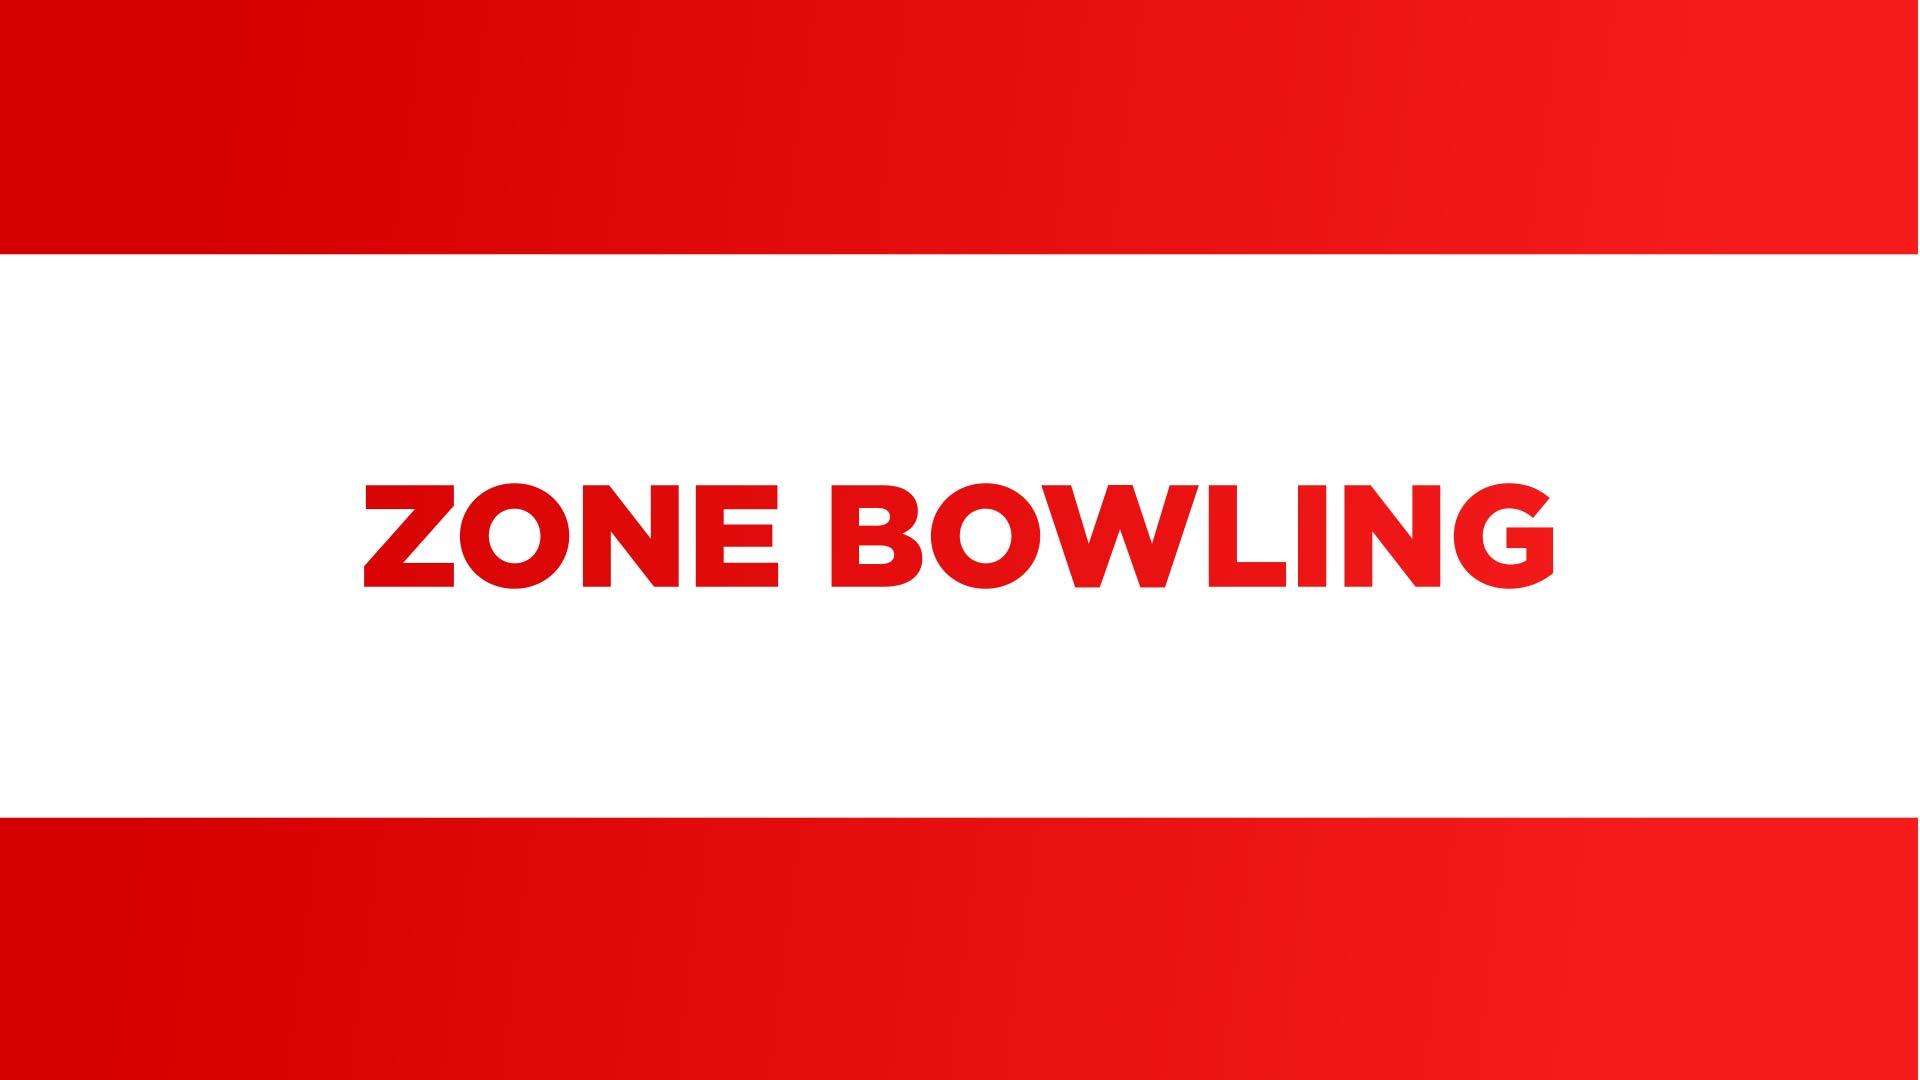 Zone Bowling (0-00-30-16)